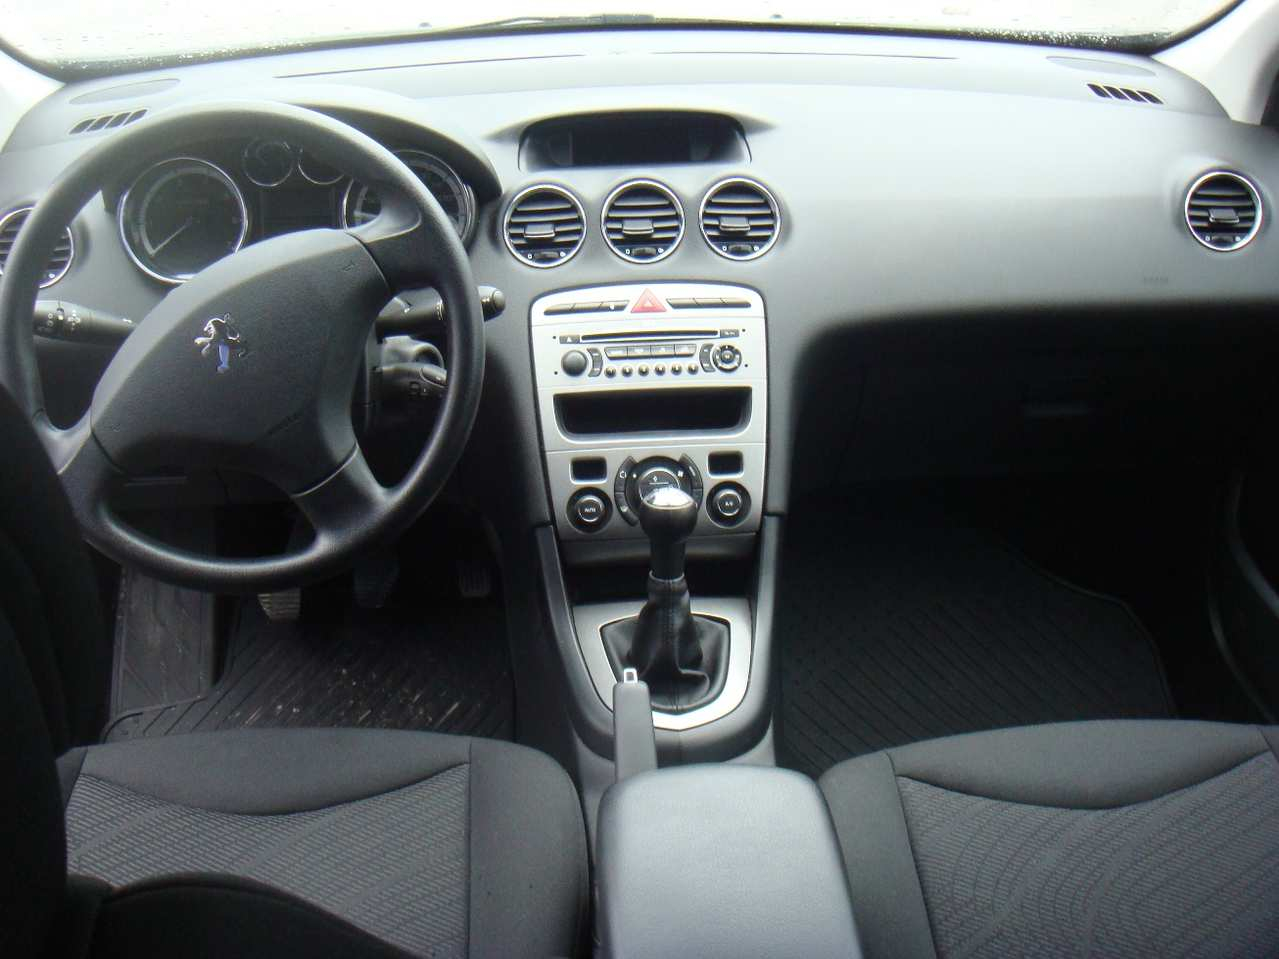 2008 Peugeot 308 Wallpapers 1 6l Gasoline Ff Manual